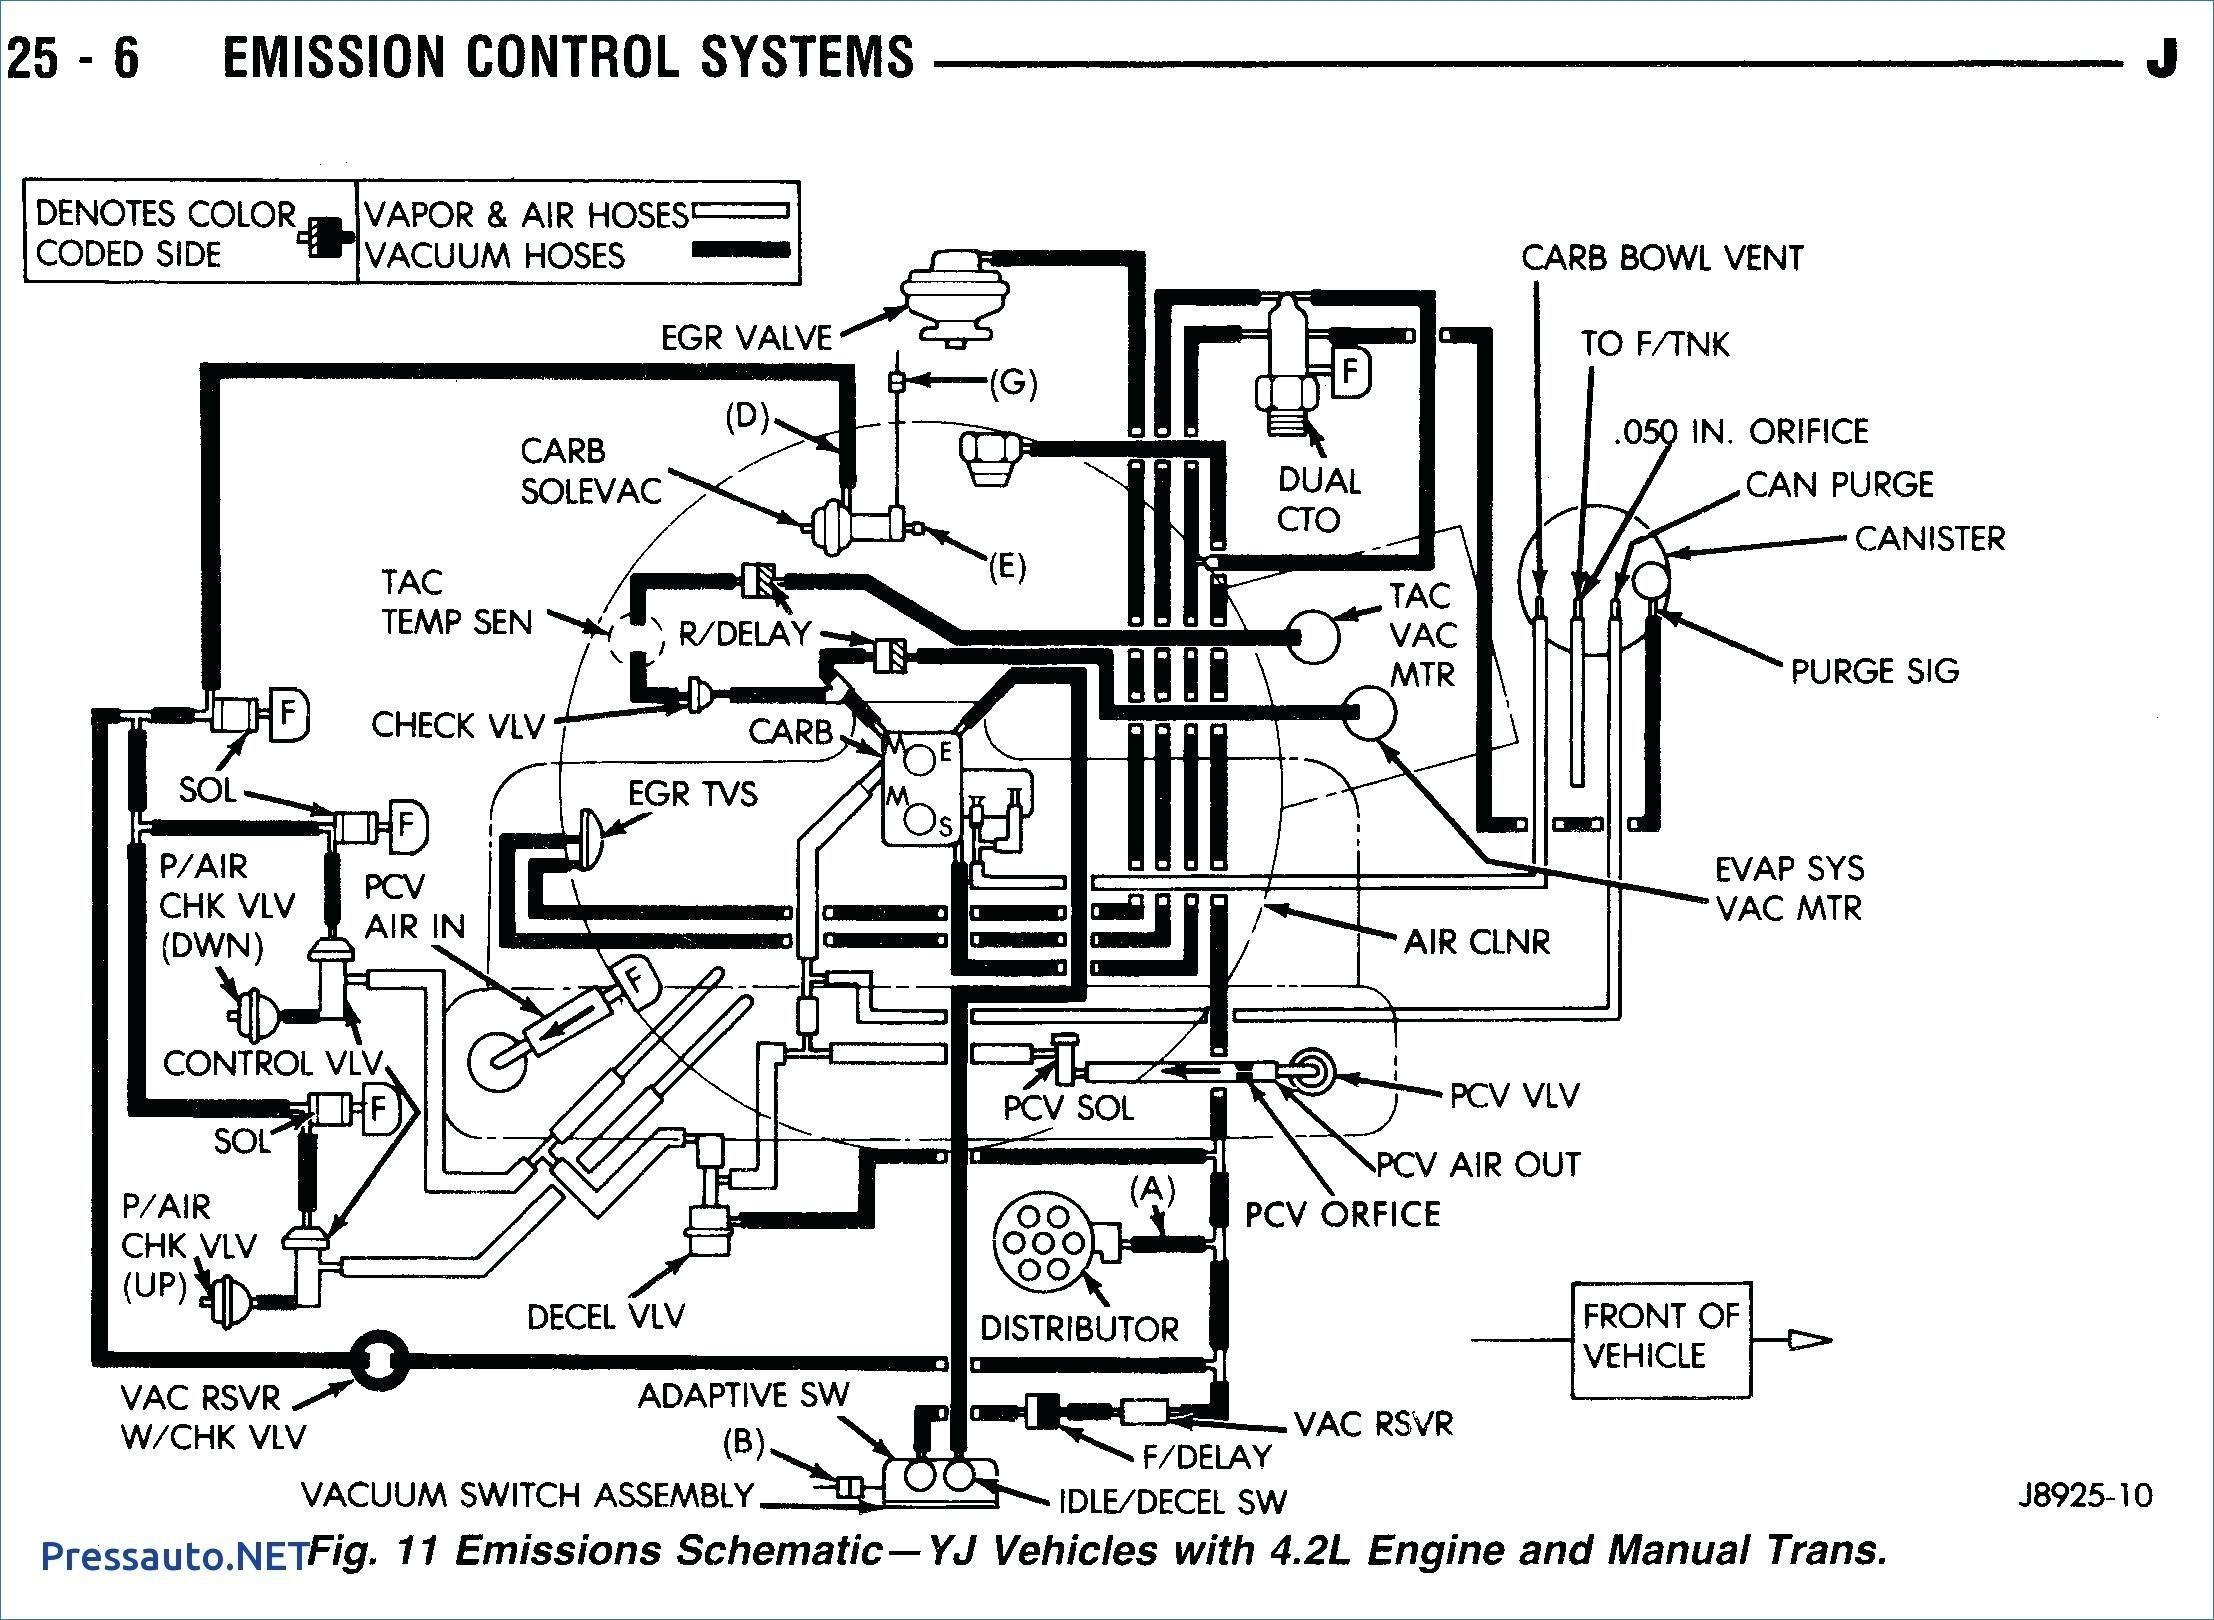 free wiring diagram Jeep Grand Cherokee Fuel Pump Wiring Diagram Save 97 Jeep Wrangler